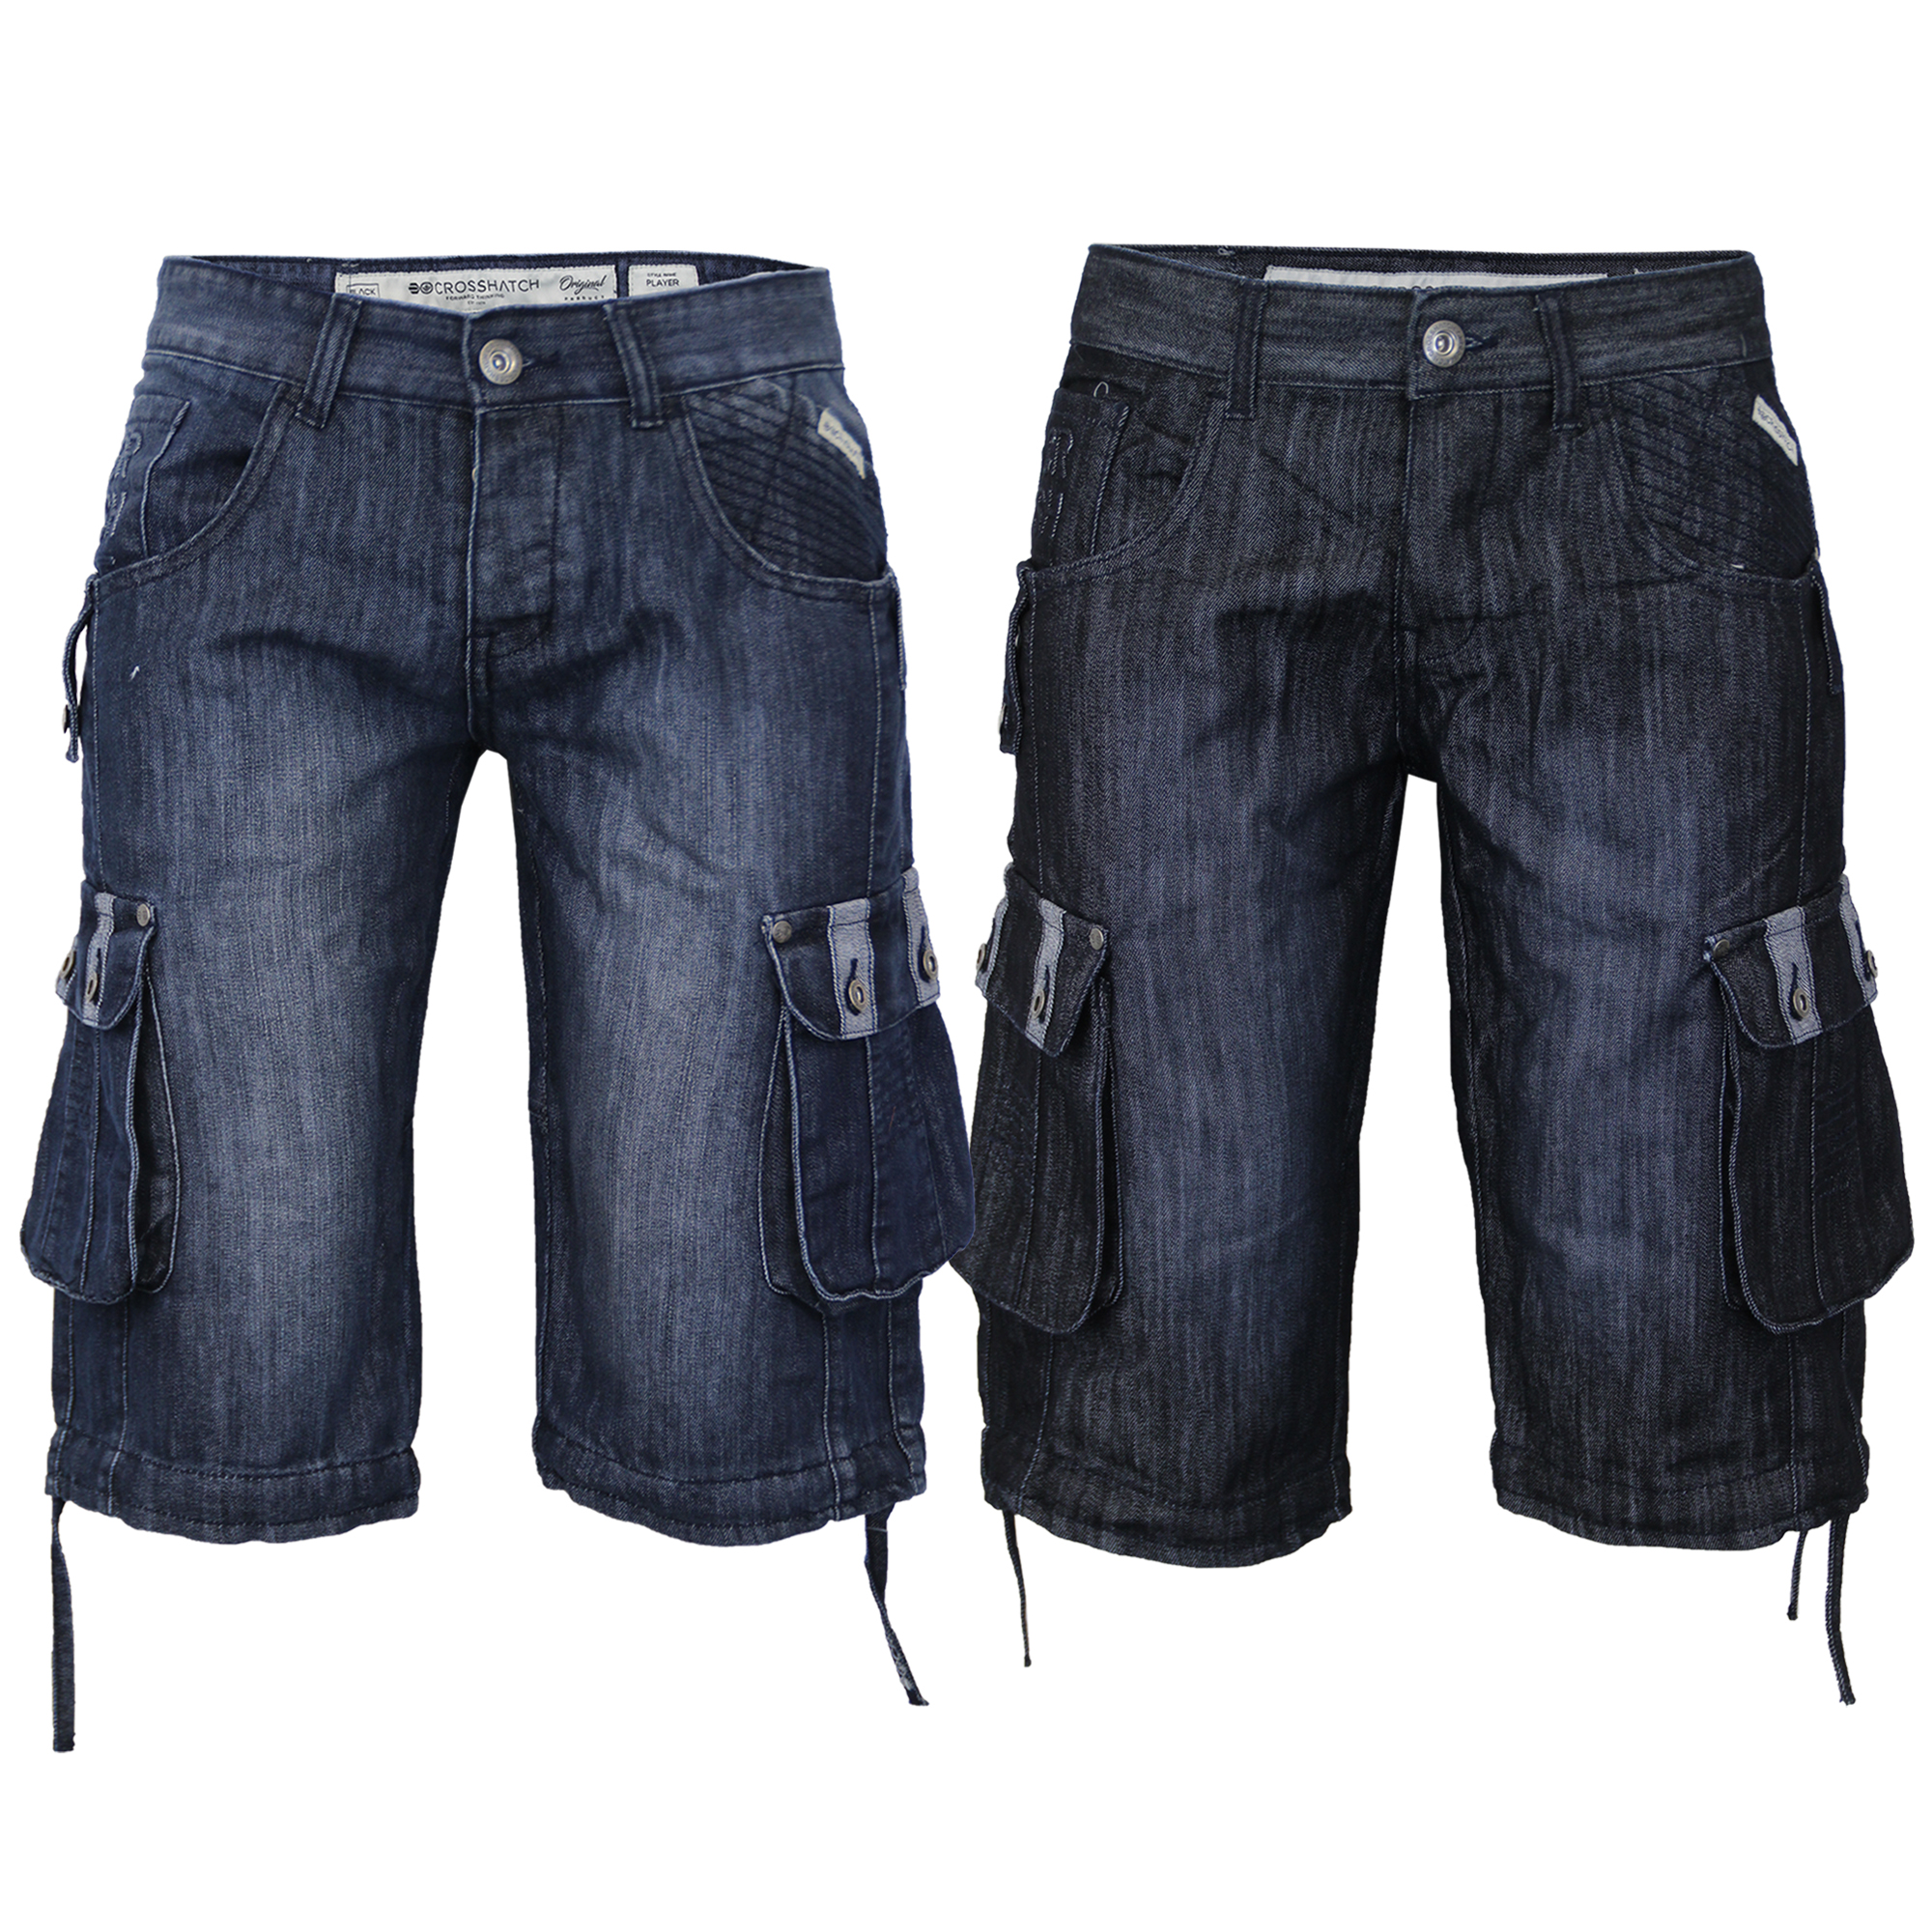 Mens-Denim-Knee-Length-Combat-Shorts-By-Crosshatch thumbnail 7